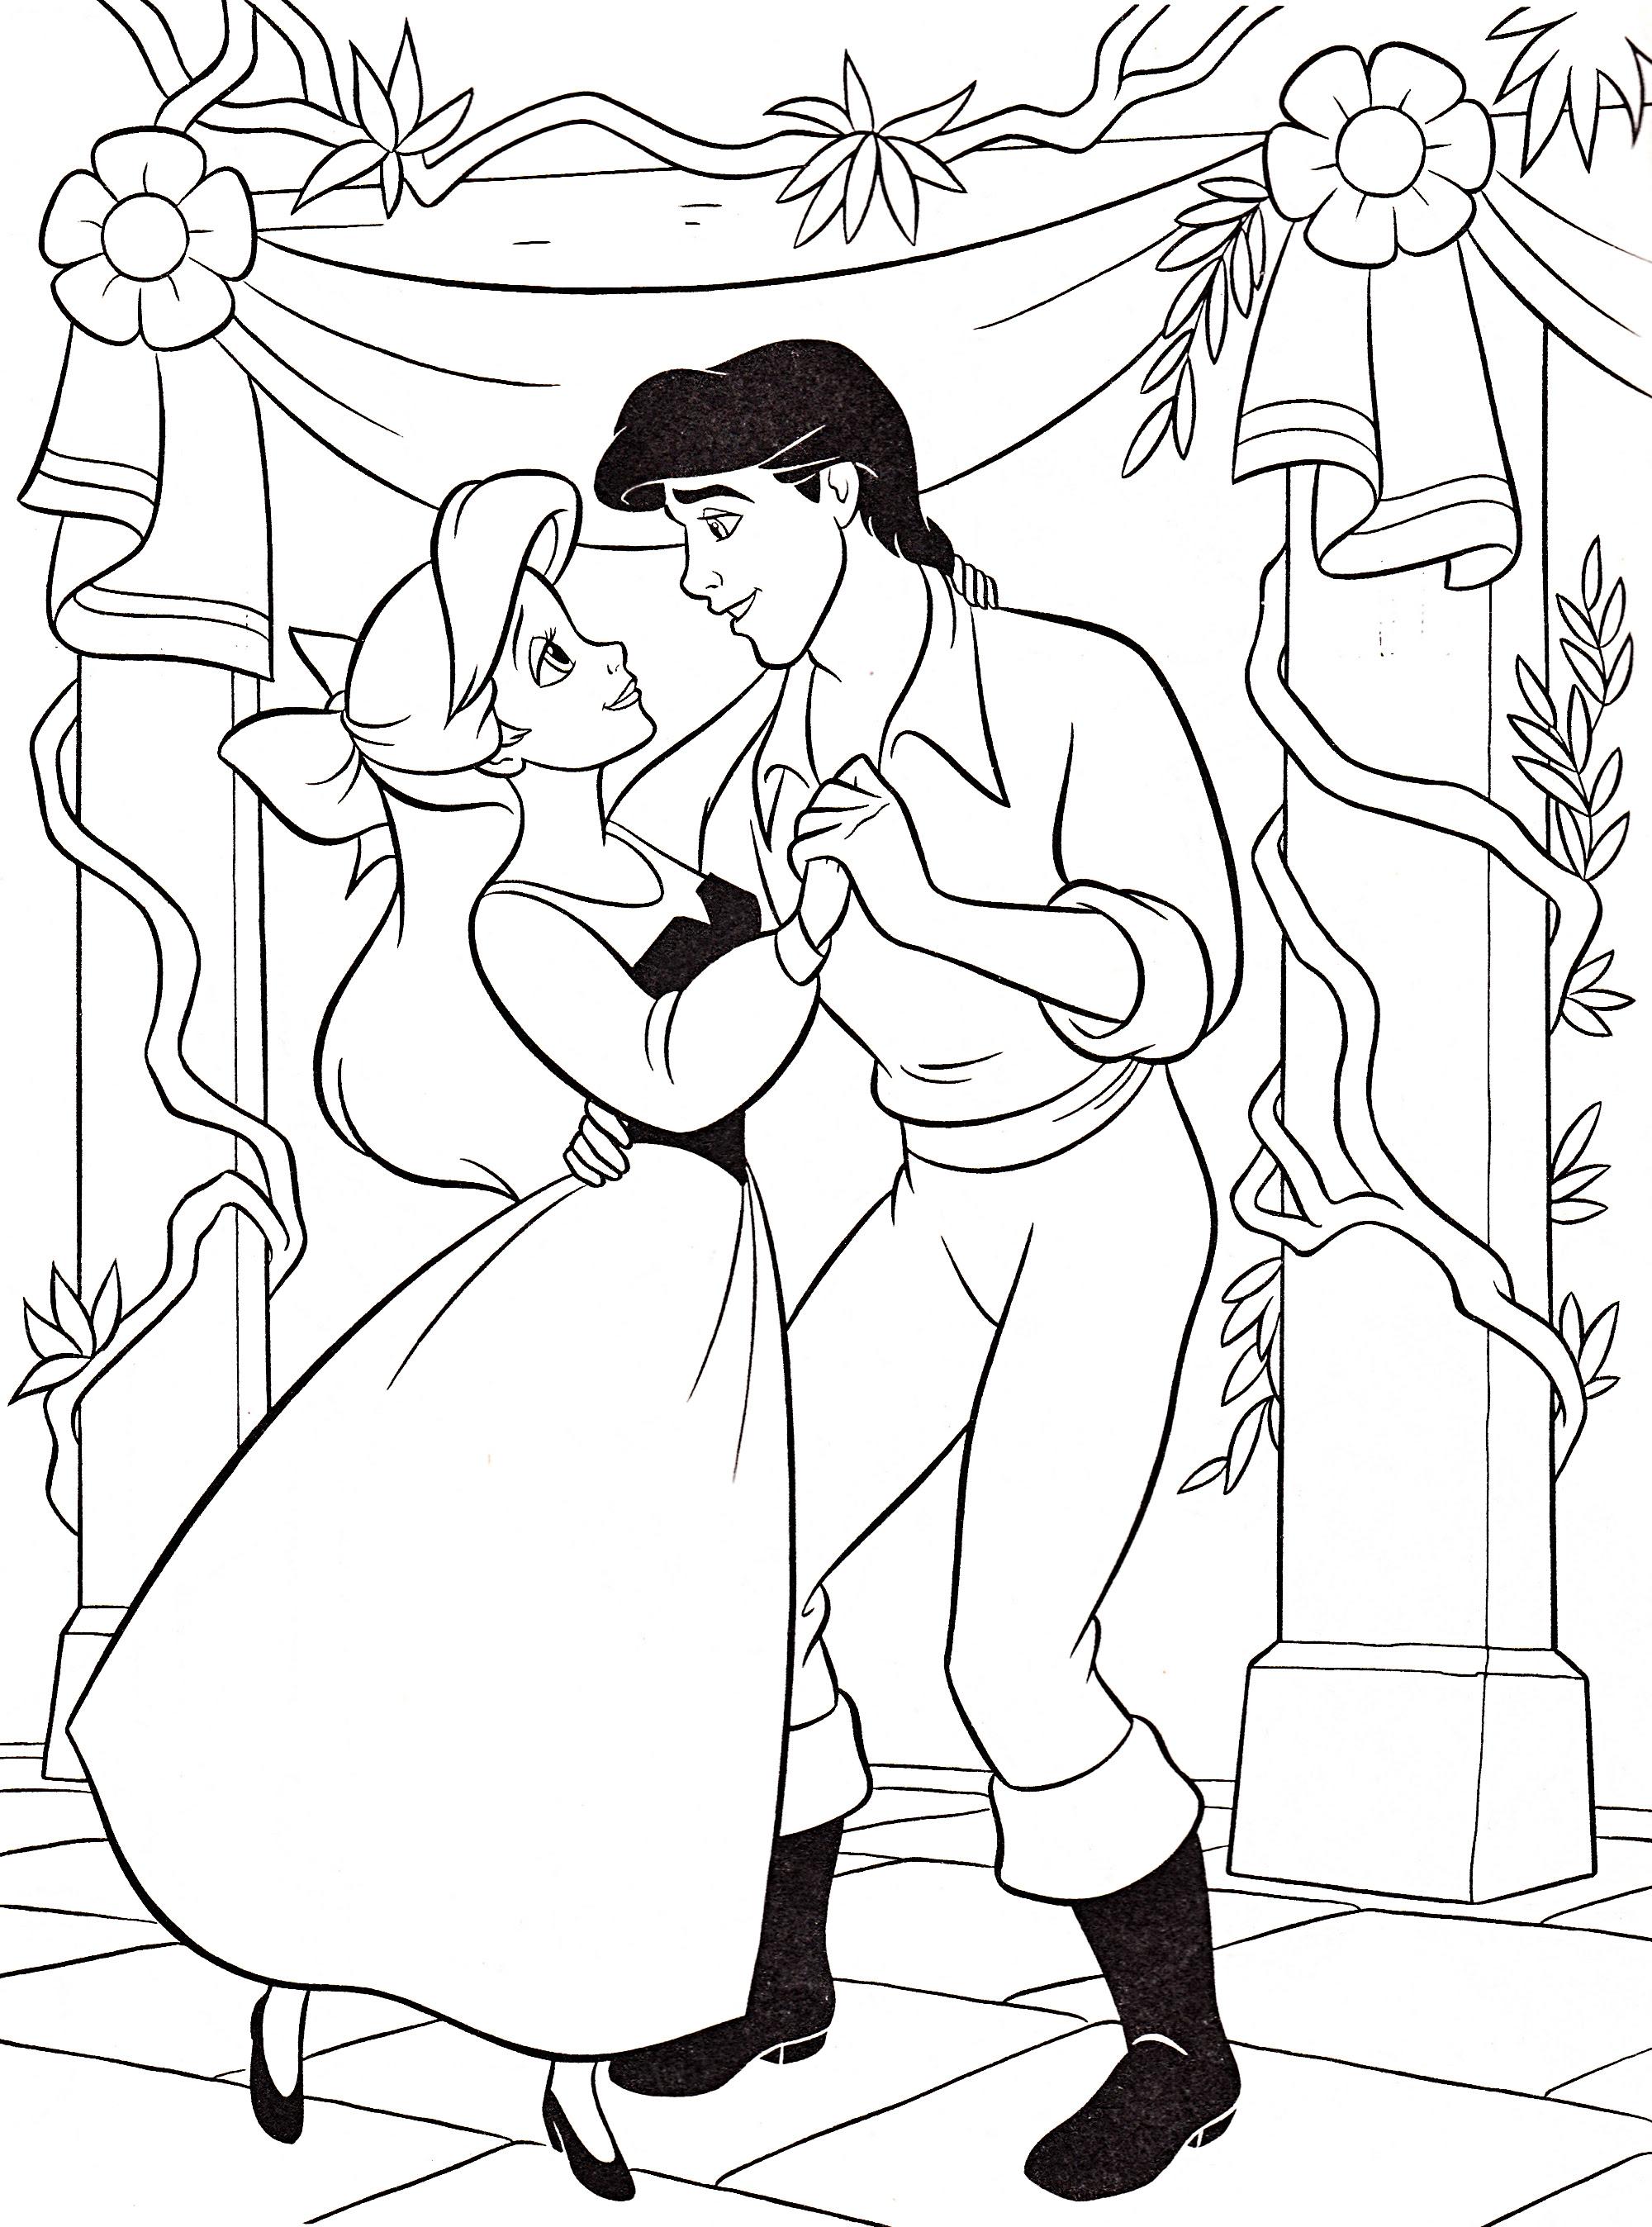 Walt Disney Coloring Pages - Princess Ariel & Prince Eric ...